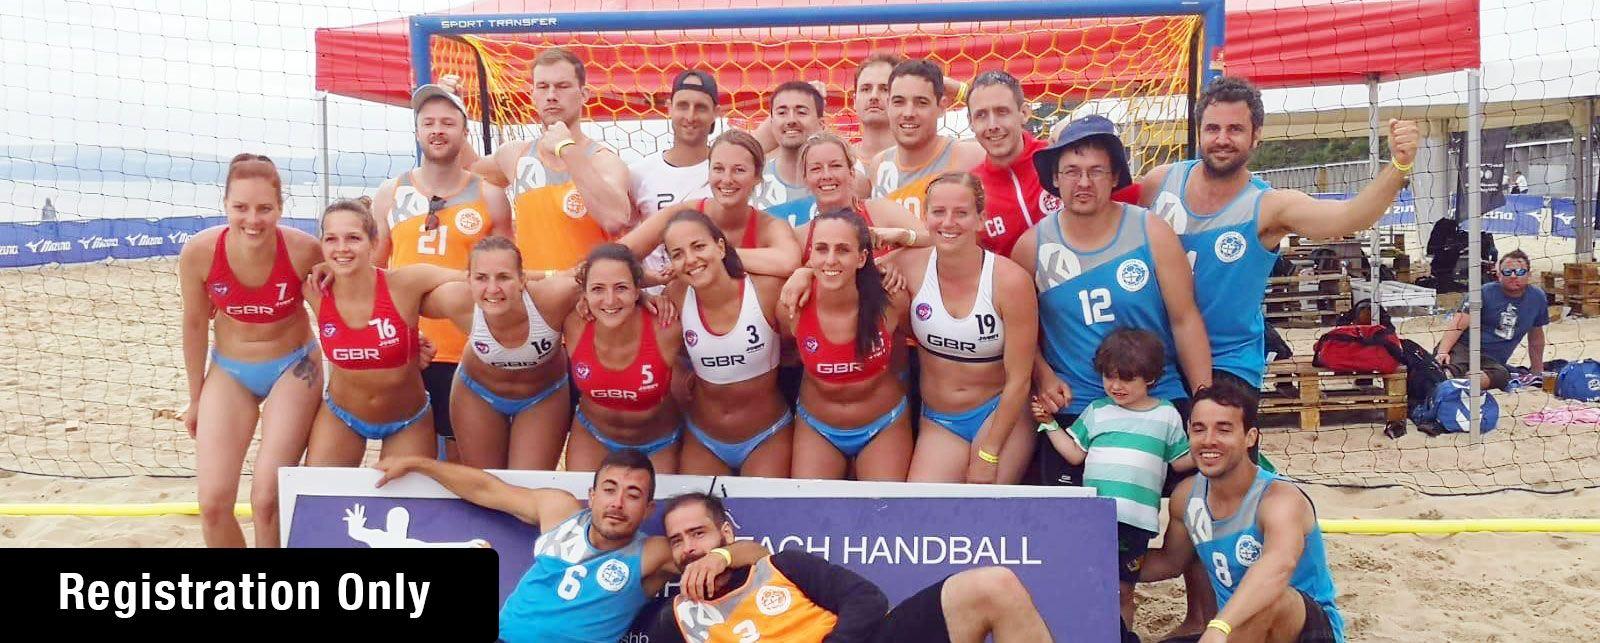 Bournemouth Beach Handball (Registration only)